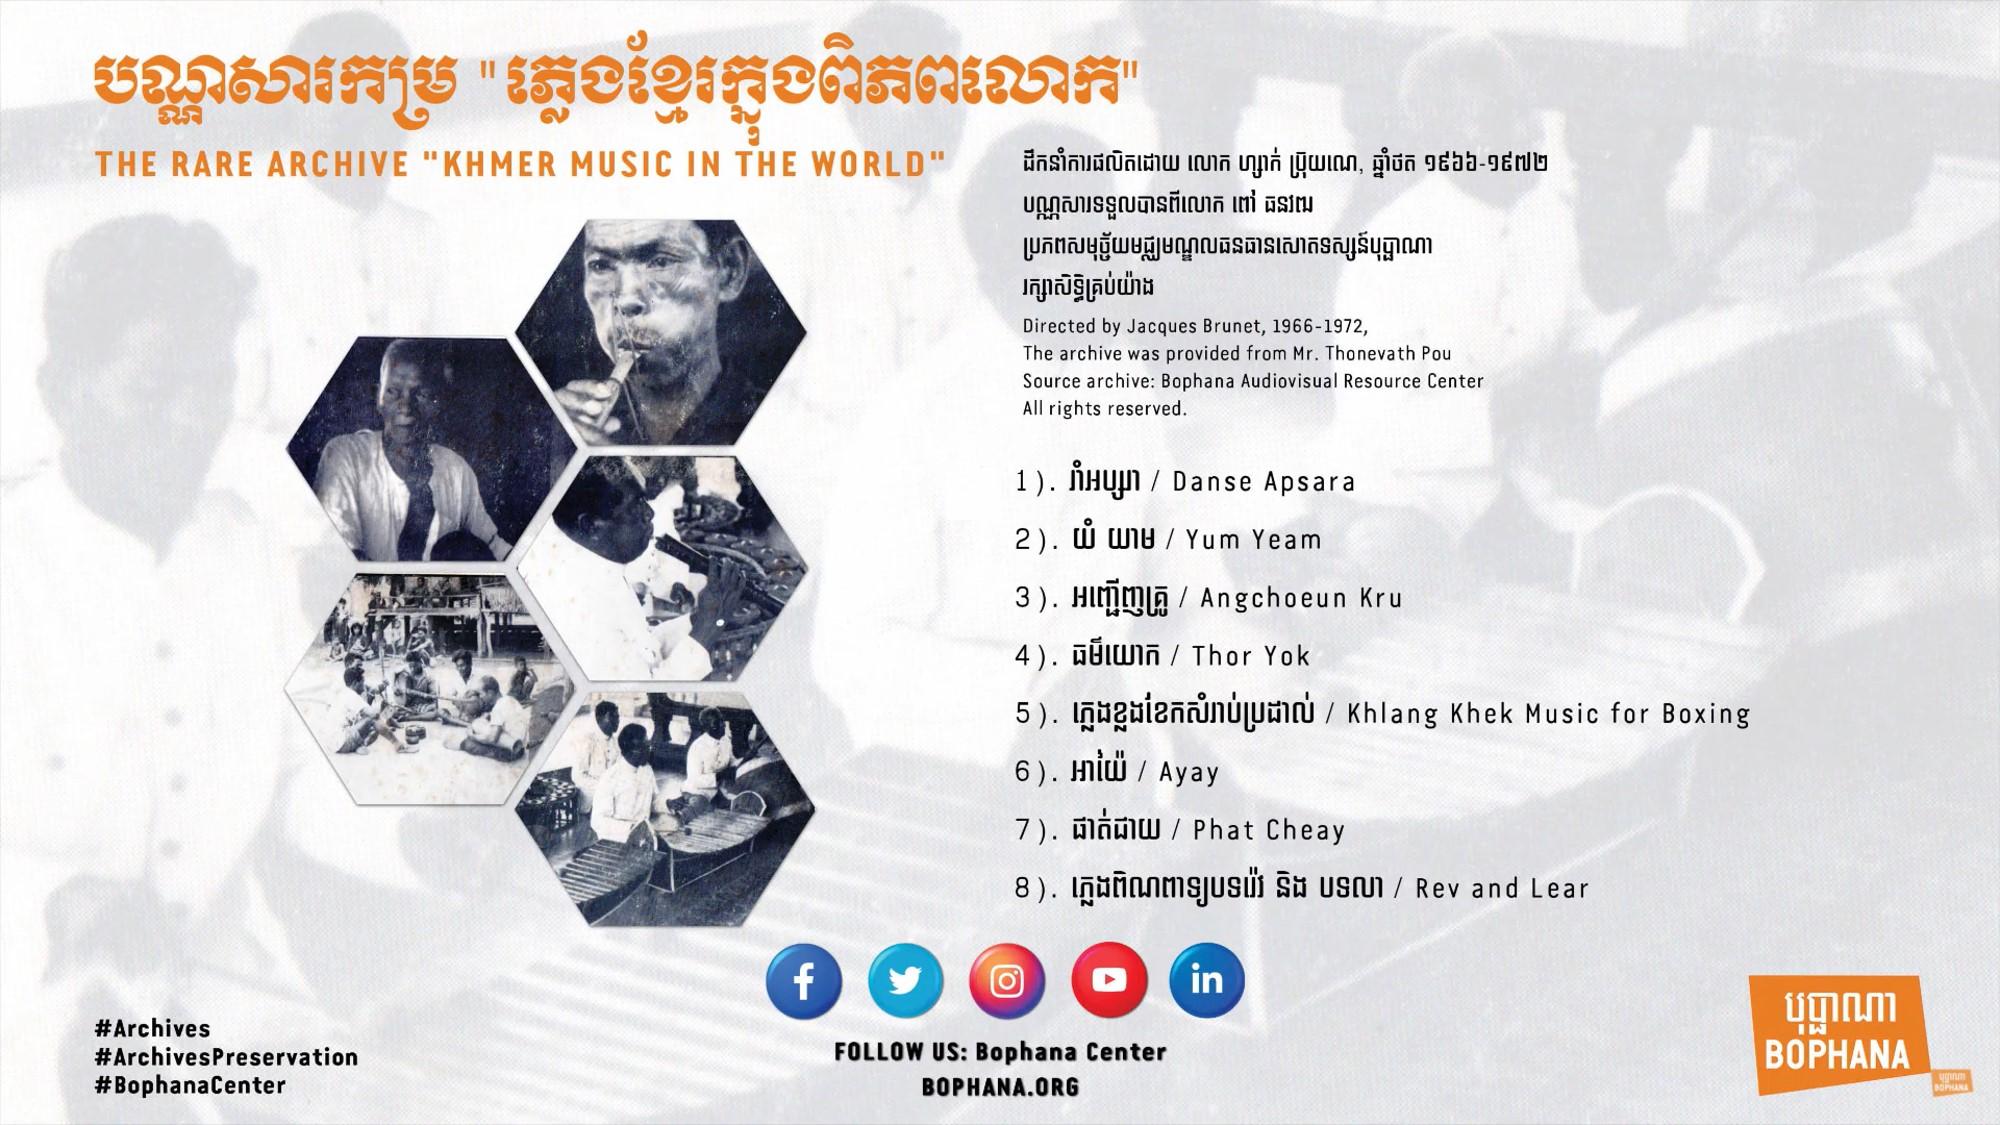 Khmer Music in the World